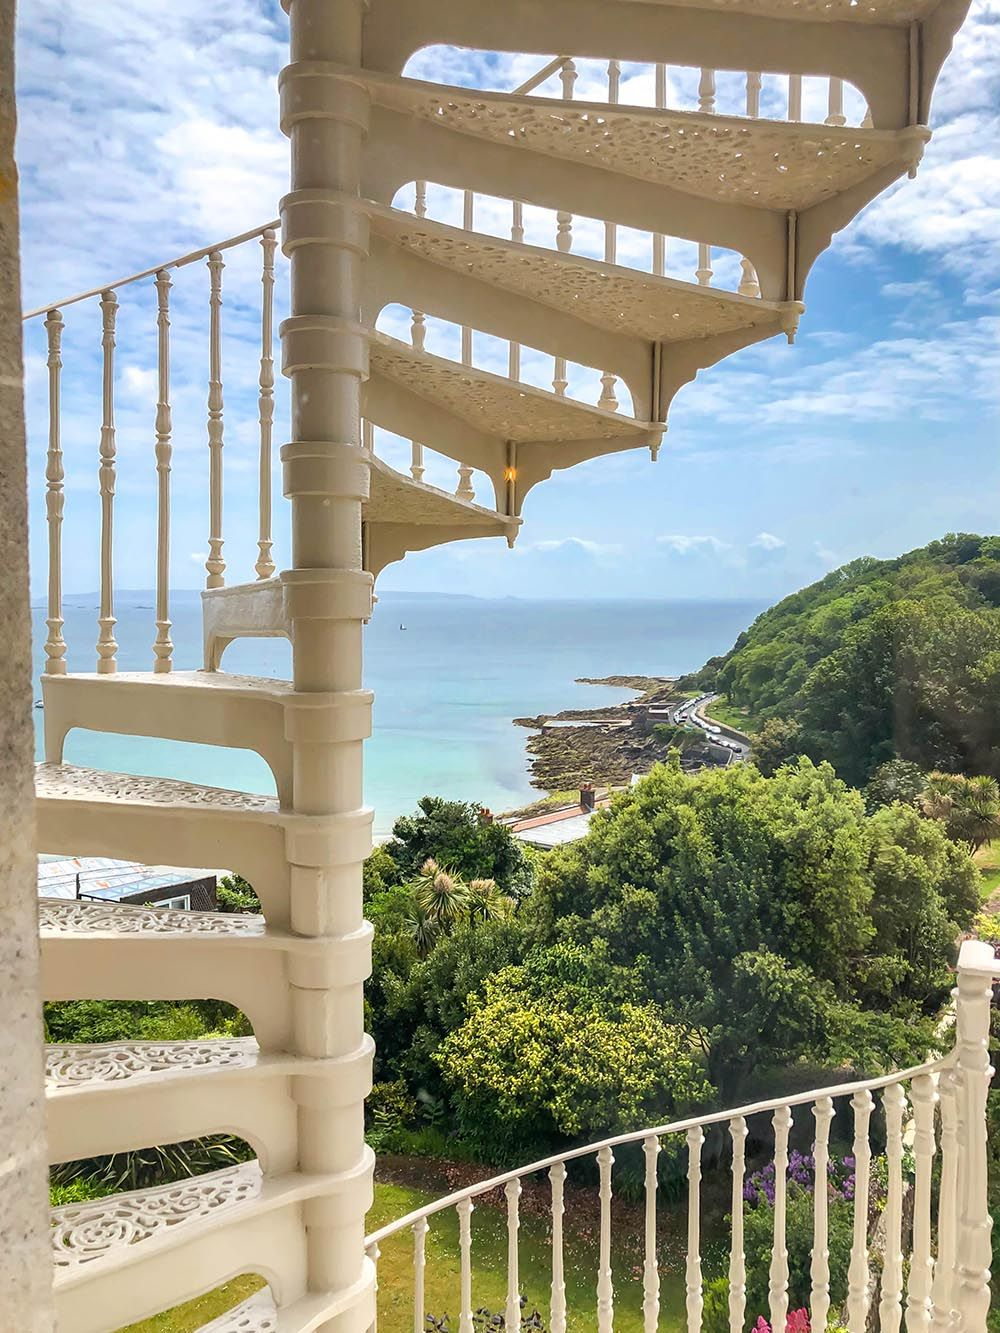 Victor Hugo House Guernsey Island UK